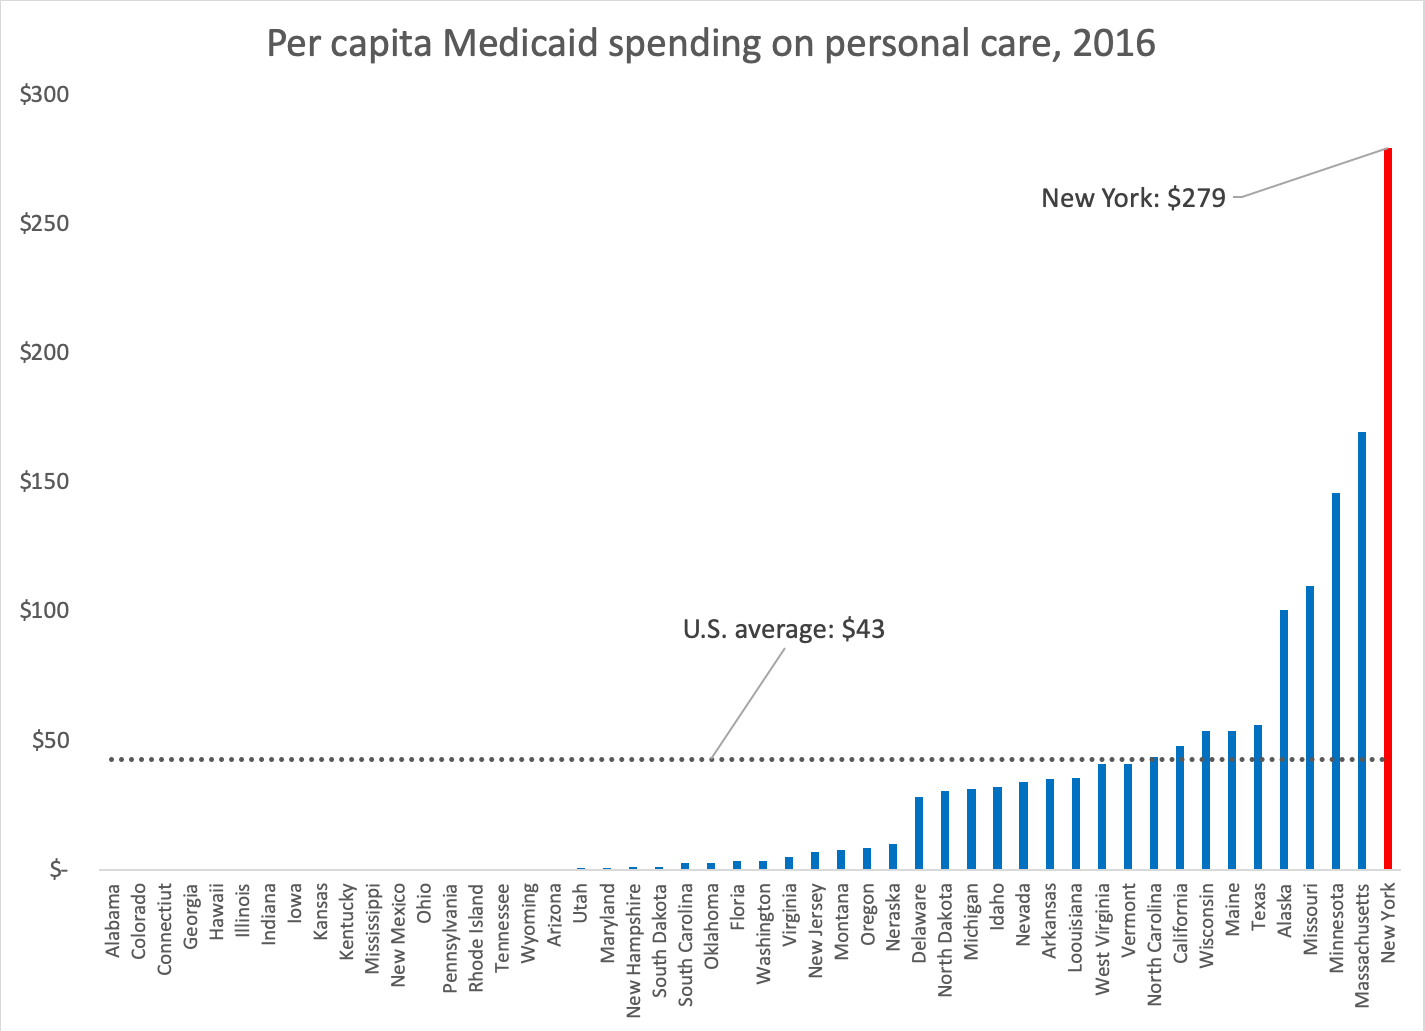 personal-care-per-cap-chart-6025805